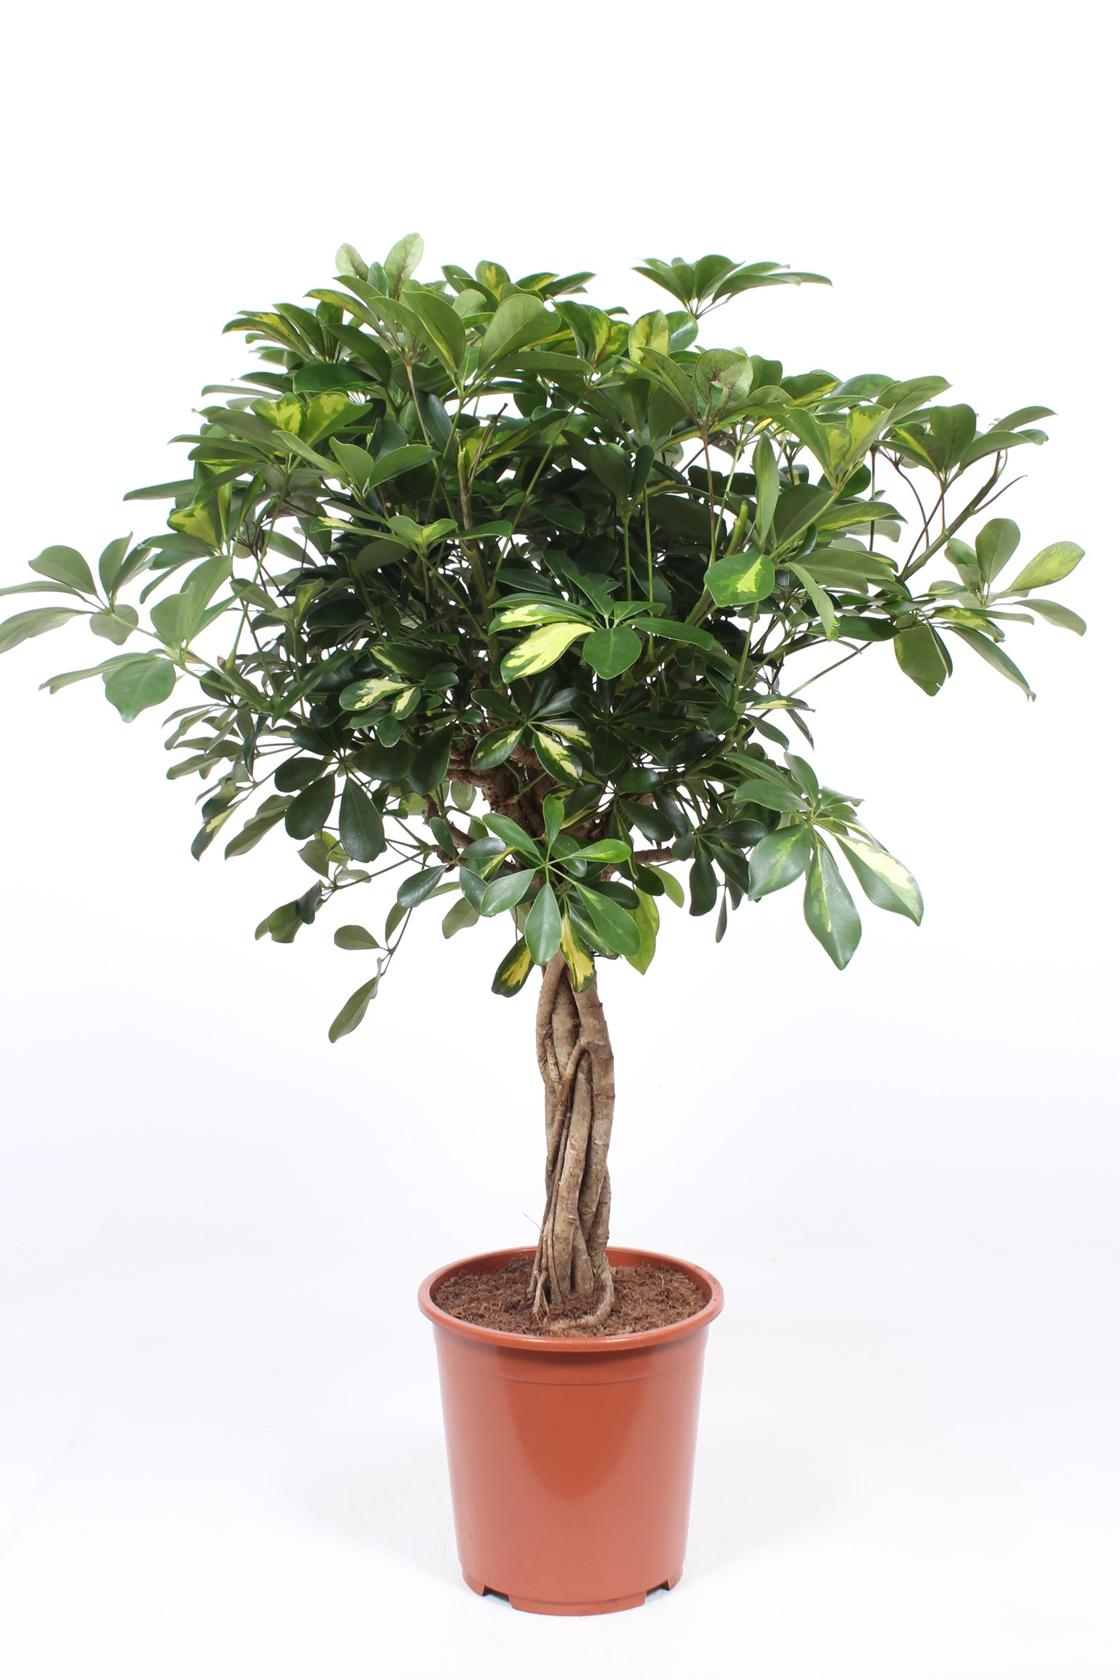 Vingerboom - Schefflera Arboricola gold capella 110cm hoog